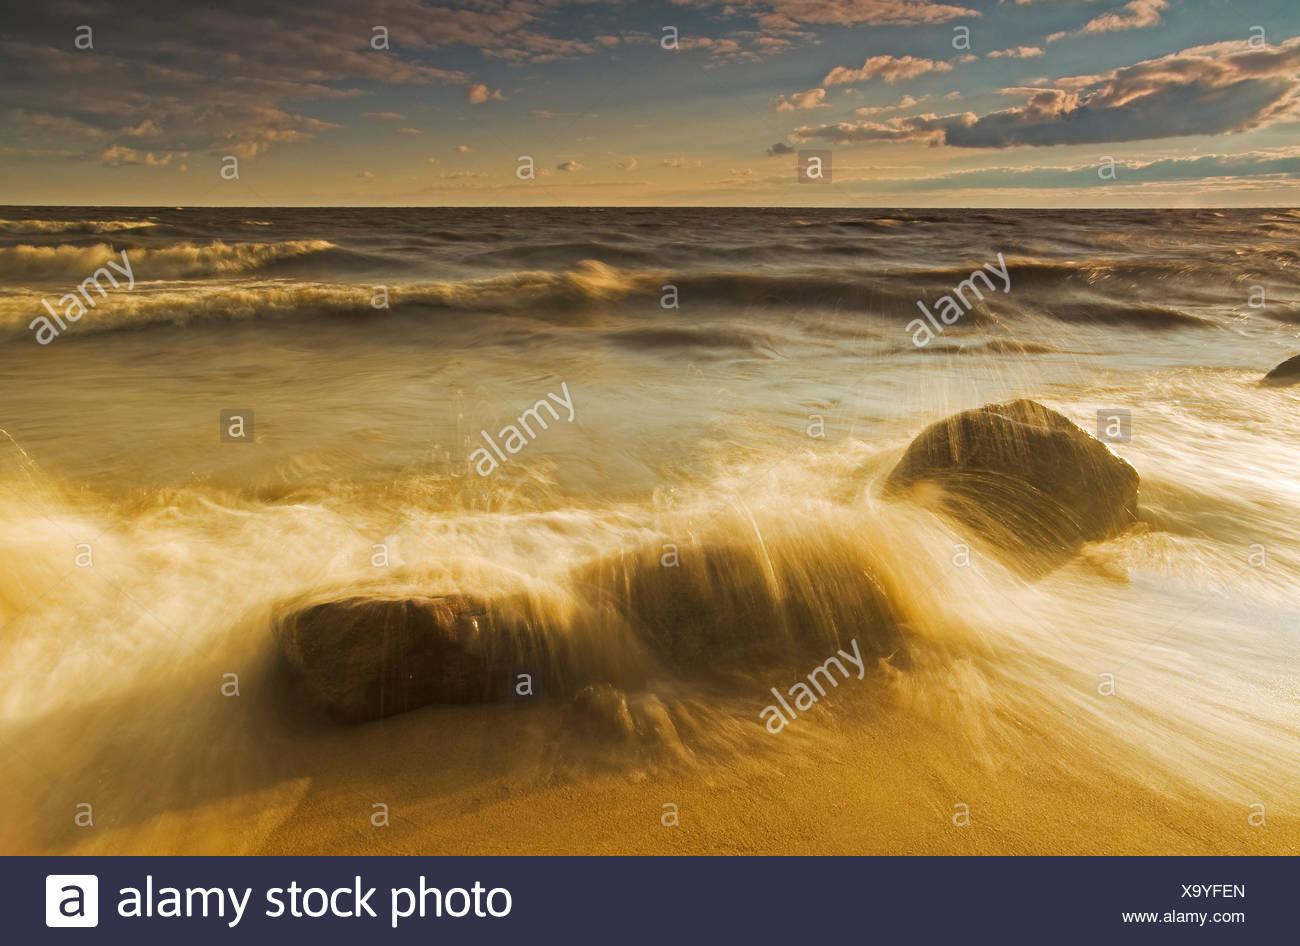 surf during a windy evening, Hillside Beach, Lake Winnipeg, Manitoba, Canada - Stock Image